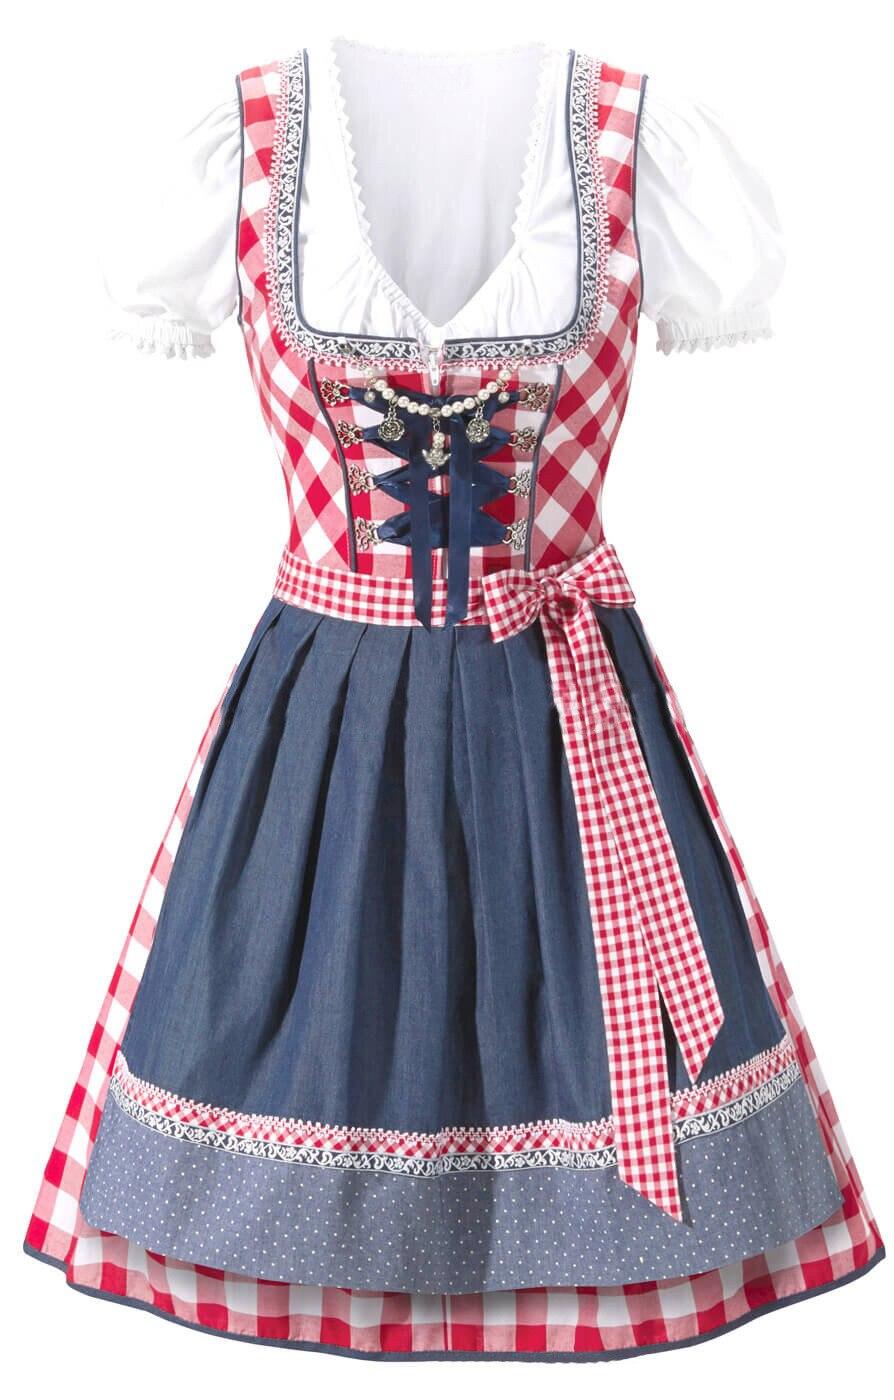 3 tlg Dirndl Traditional Costume German Austrian Bavarian Oktoberfest Beer Girl Costume Halloween Outfit